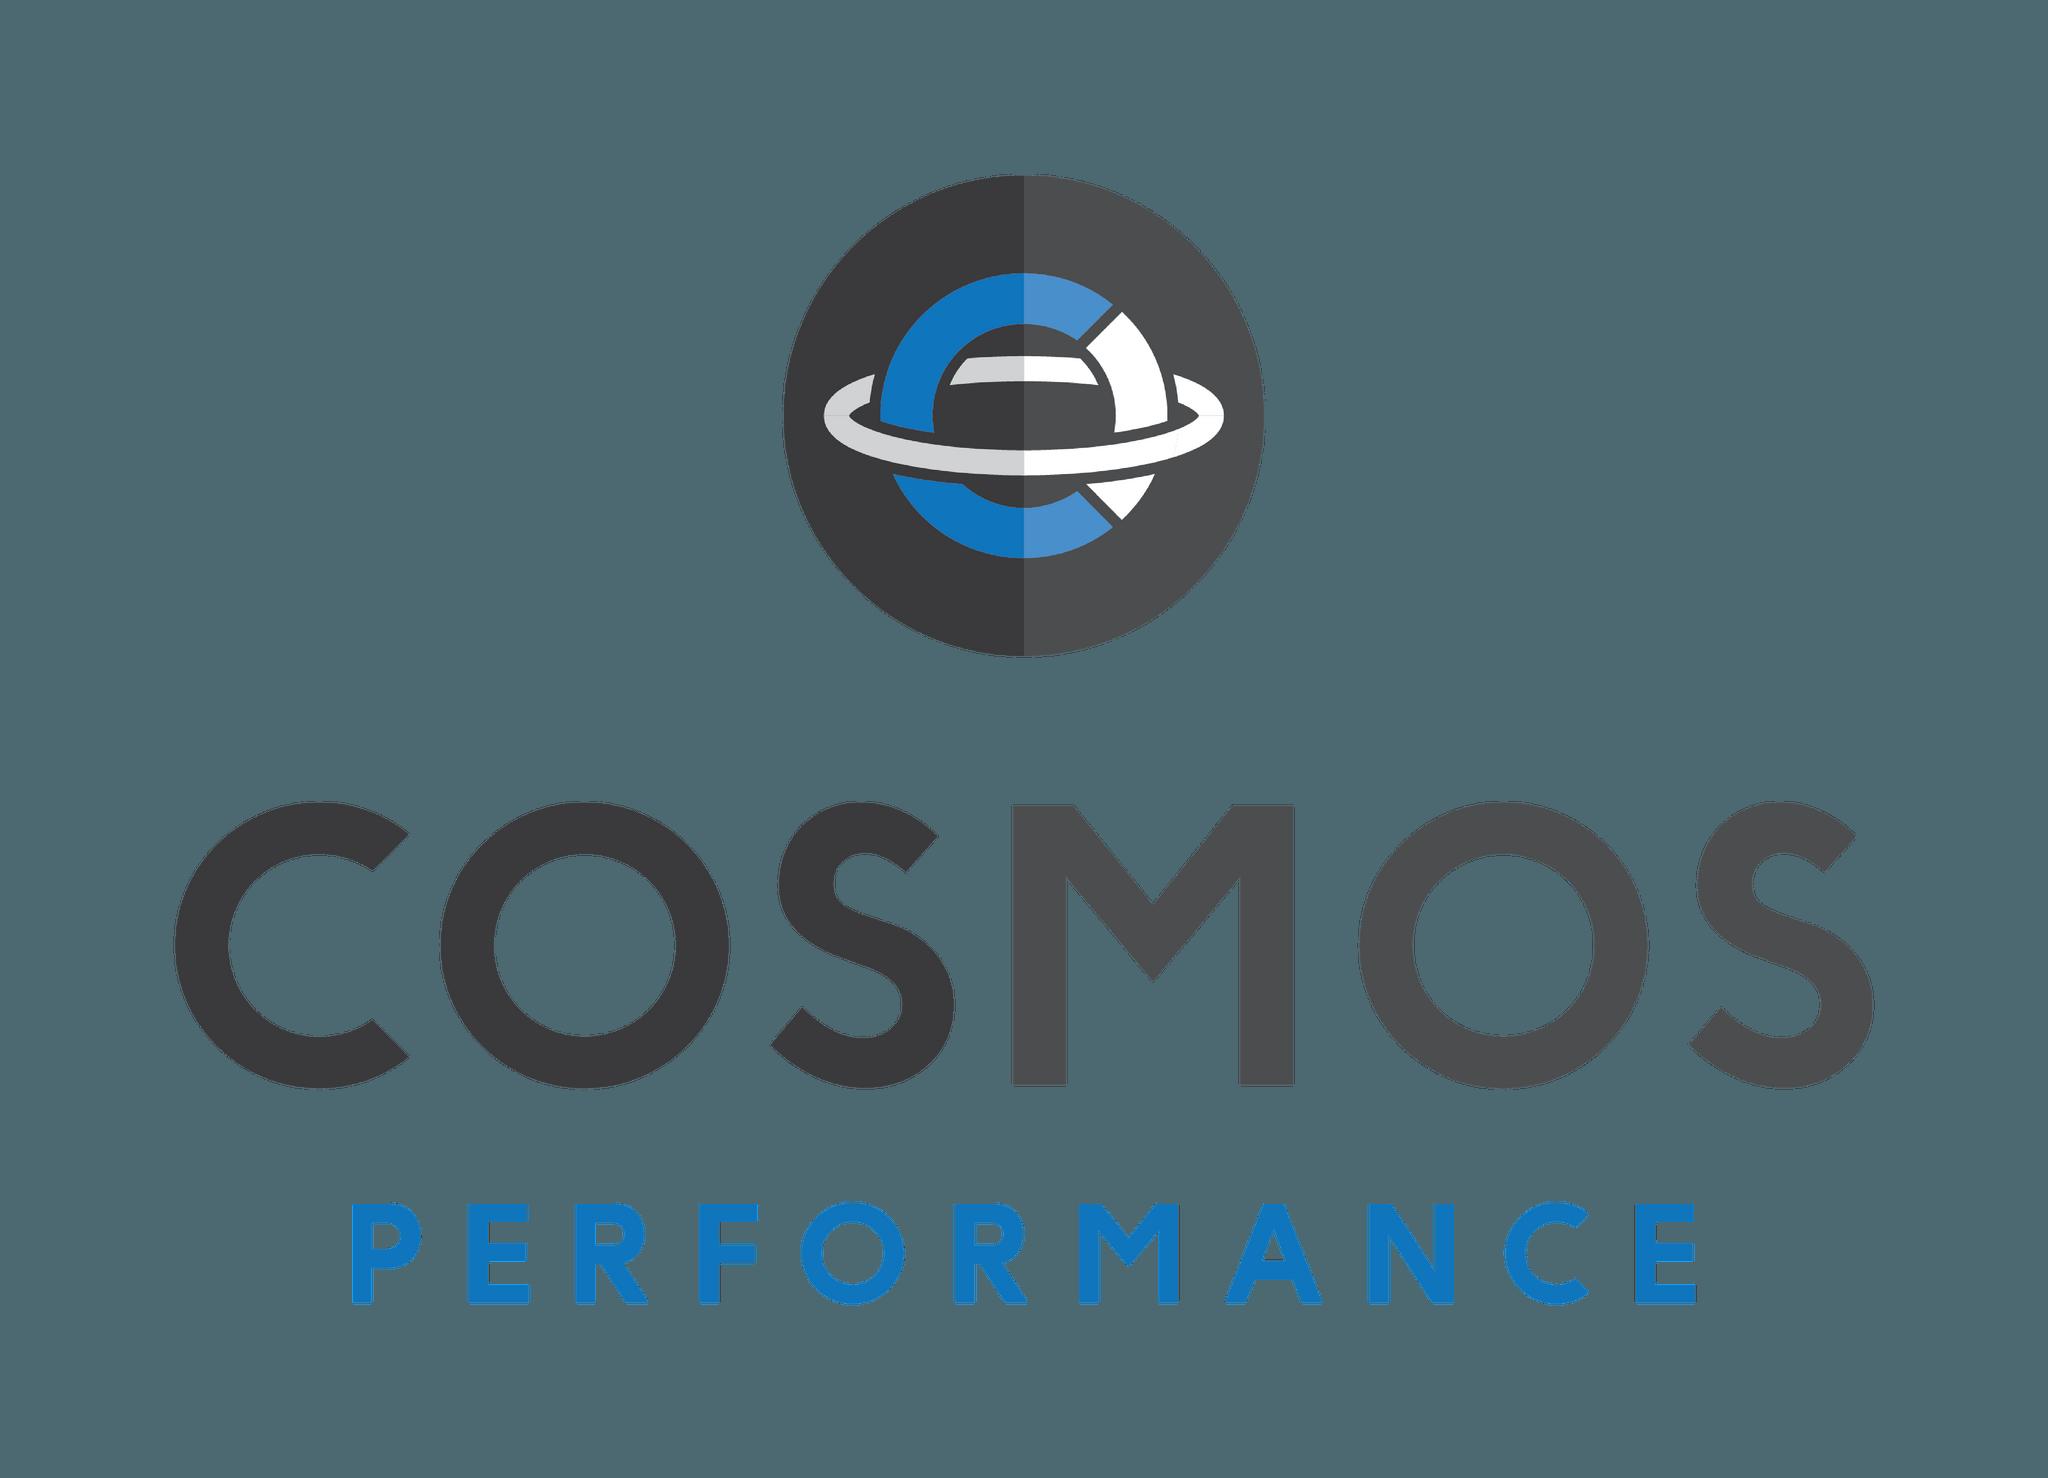 Cosmos Performance Ltd